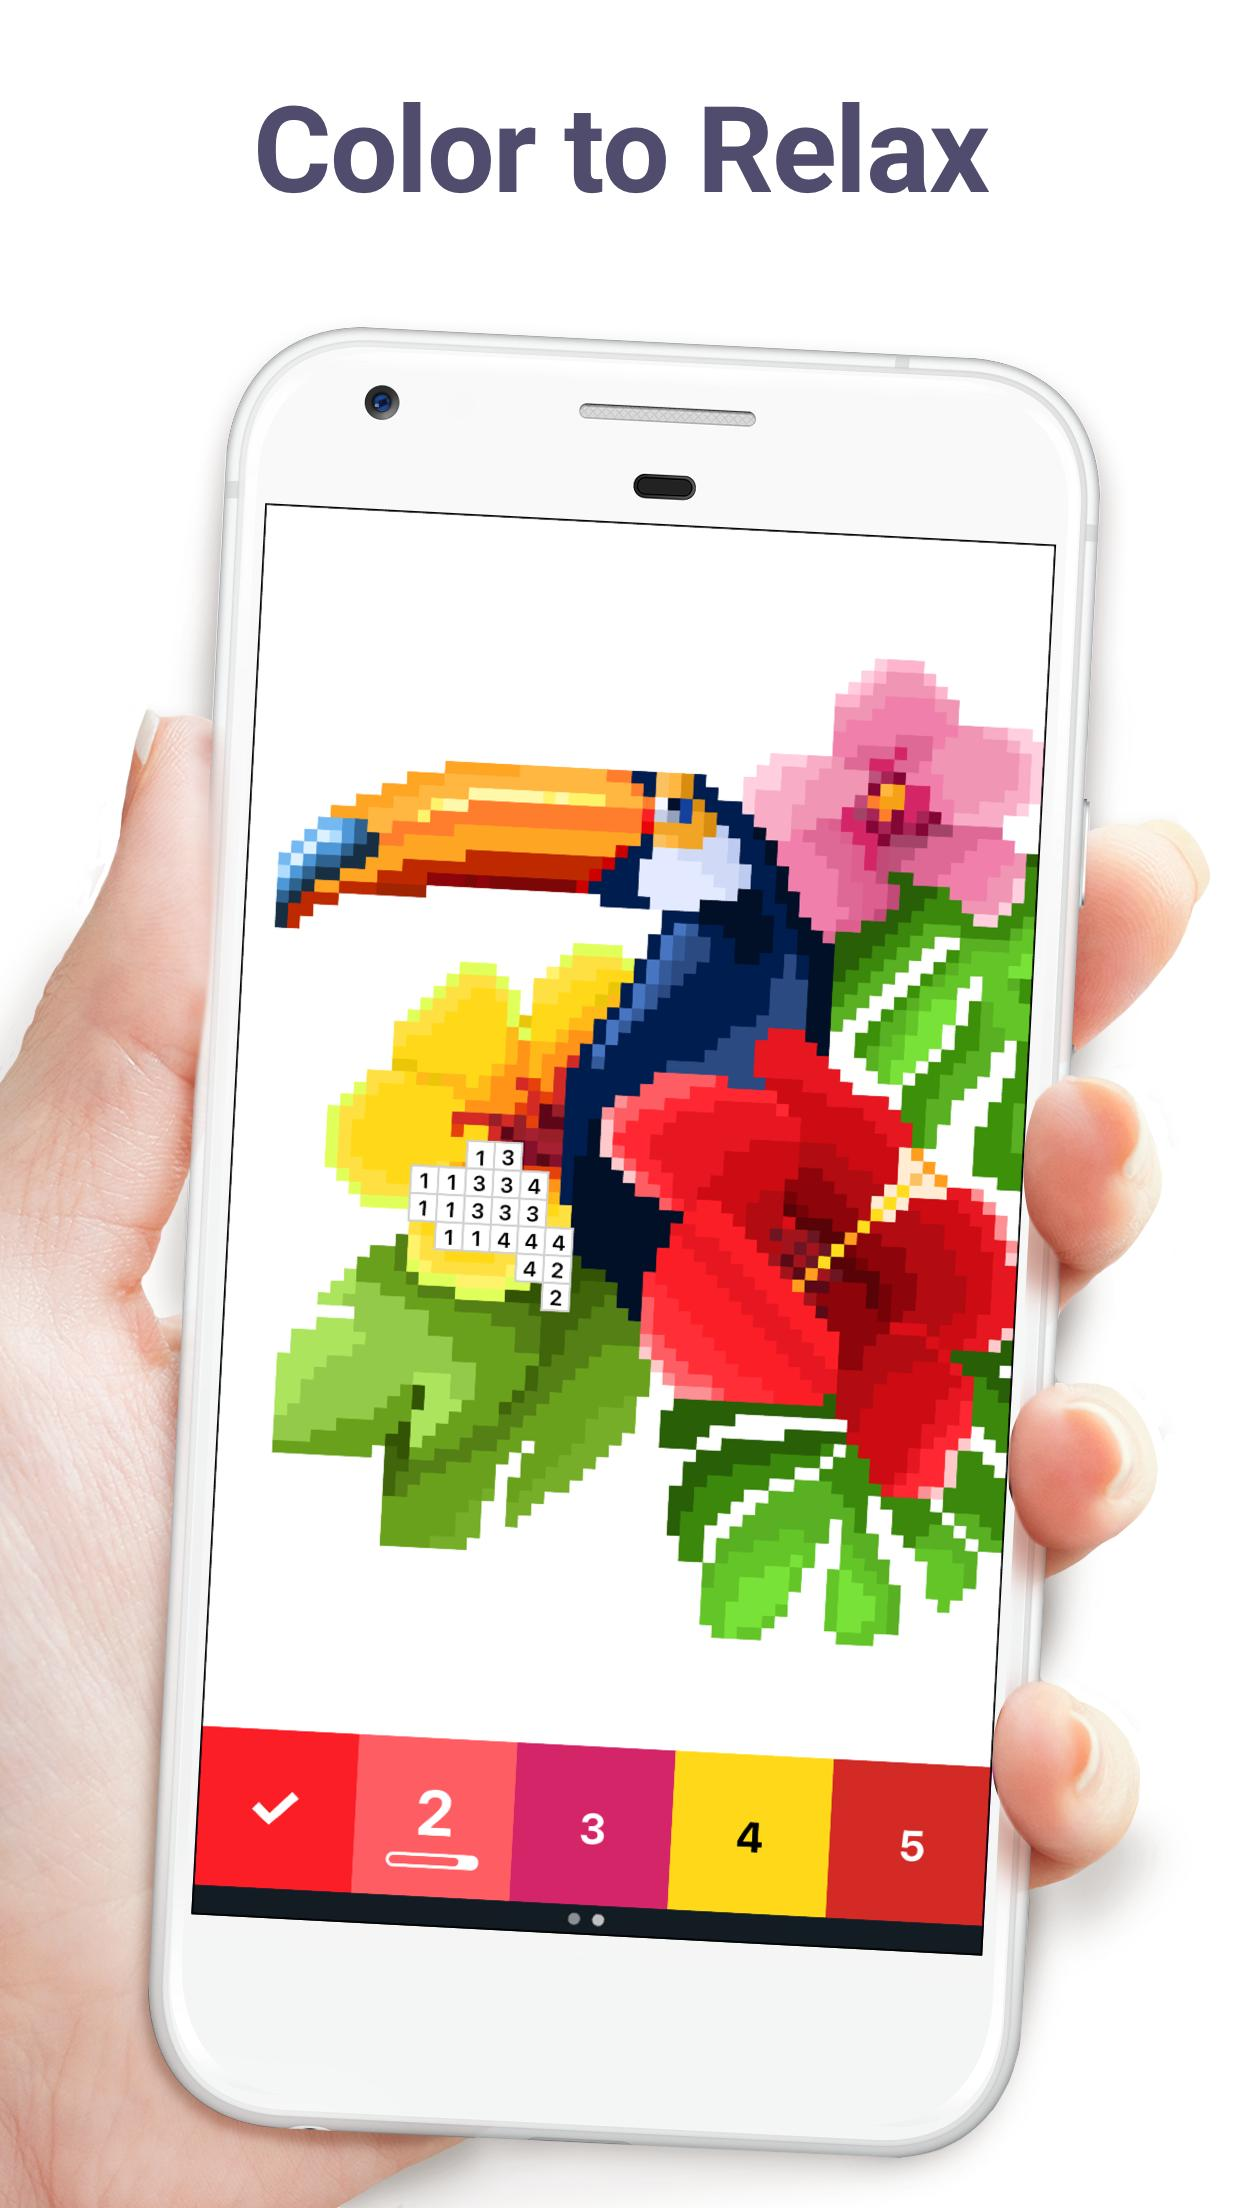 Pixel Art Color by Number 6.6.1 Screenshot 1